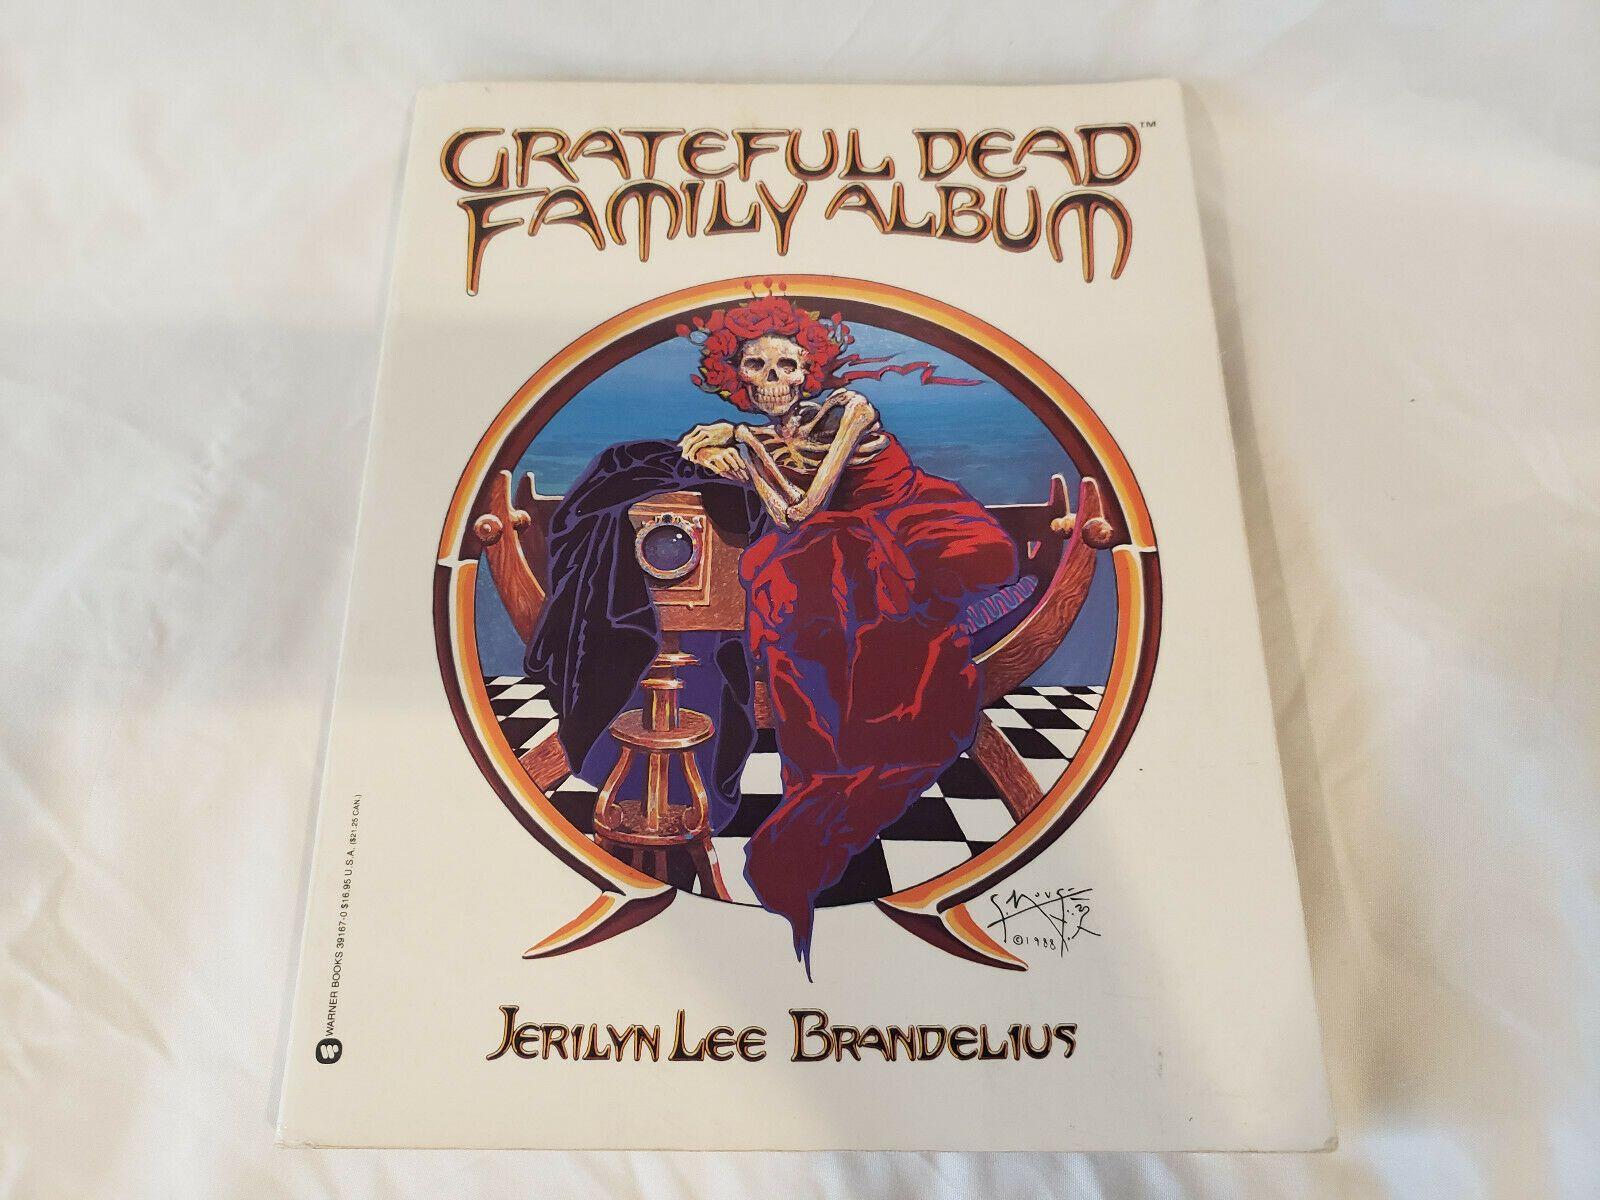 Forsale grateful dead family album 1st edition signed